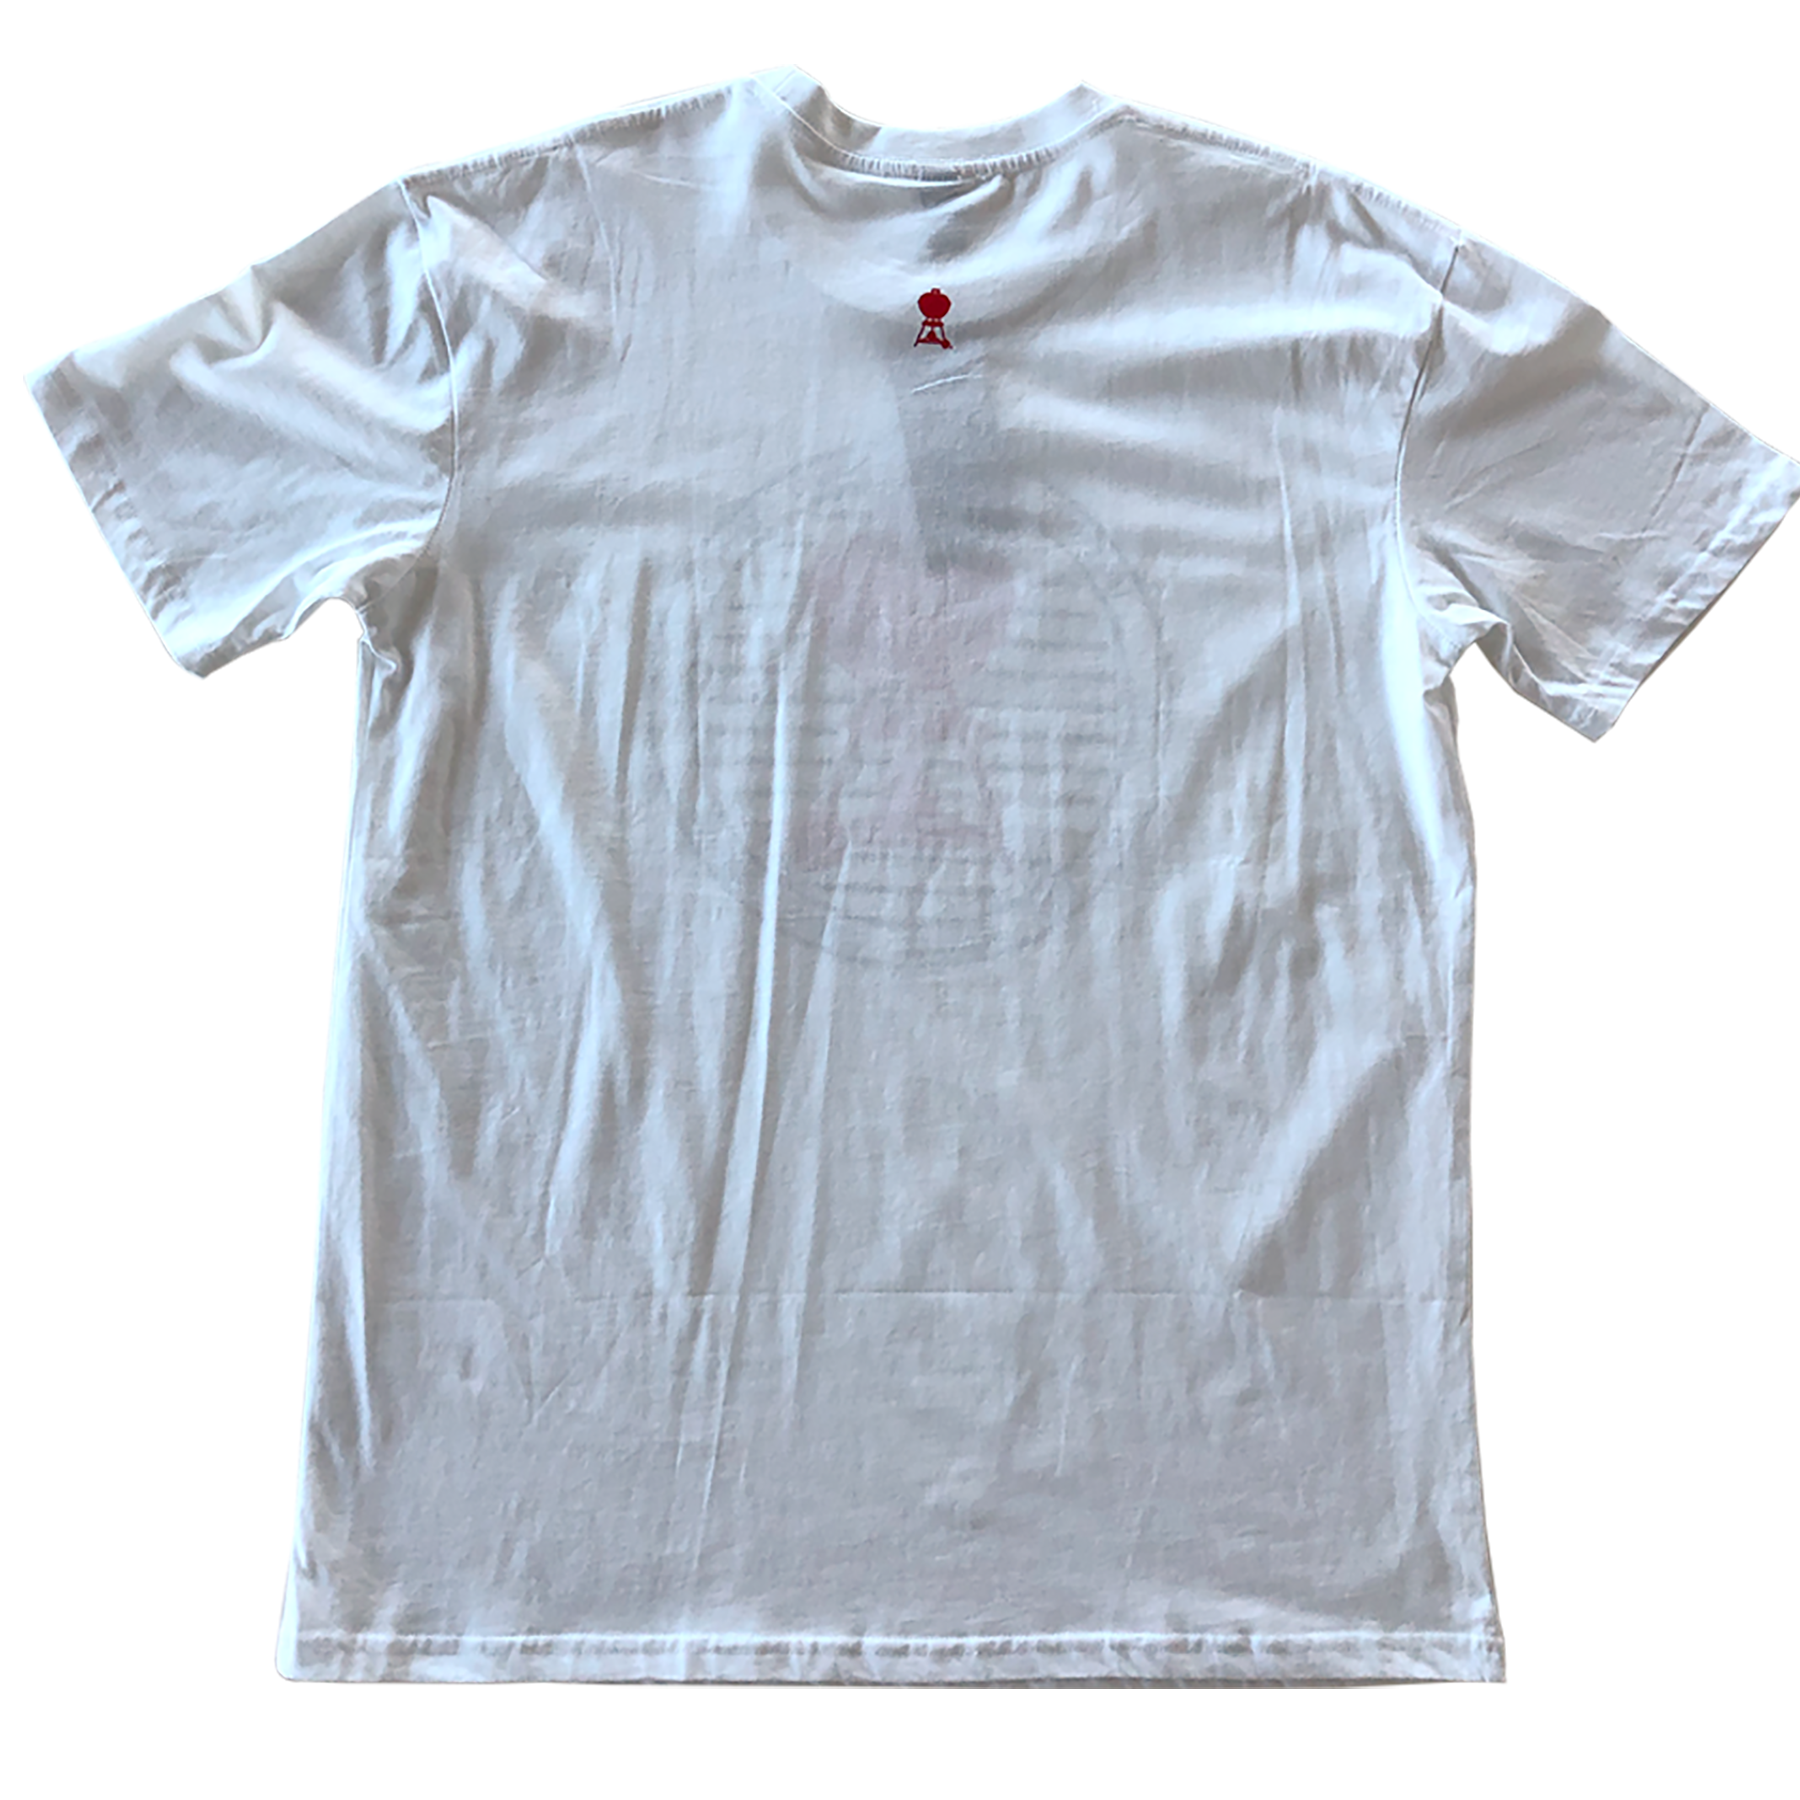 18053-Heritage-Kettle-White-back_1800-x-18000